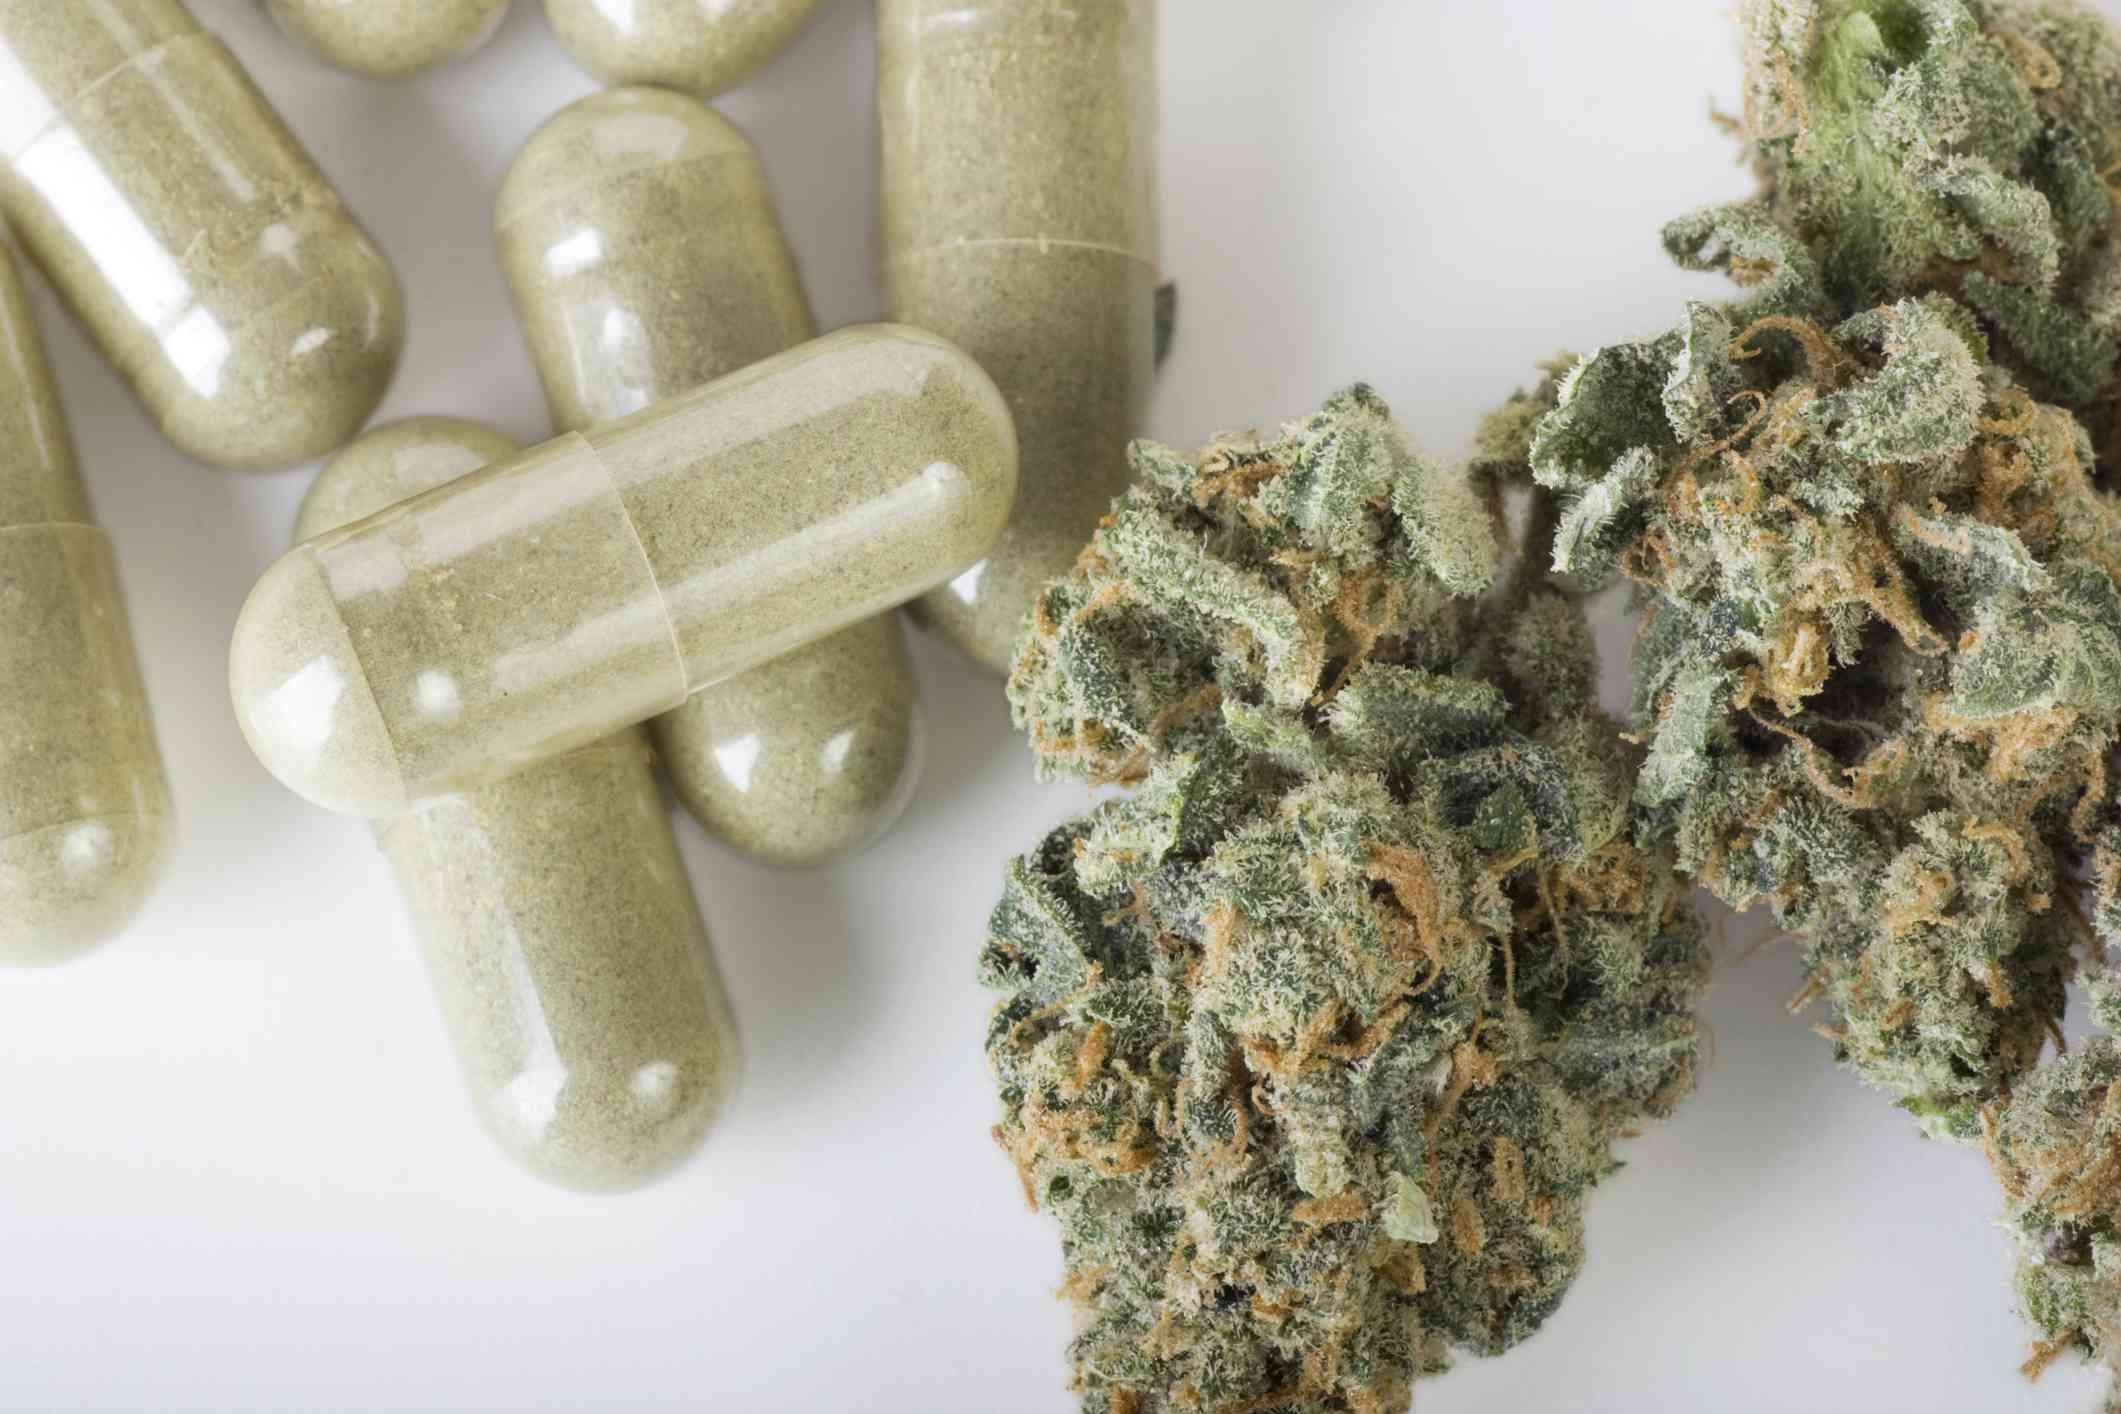 Marijuana next to pills on a white surface